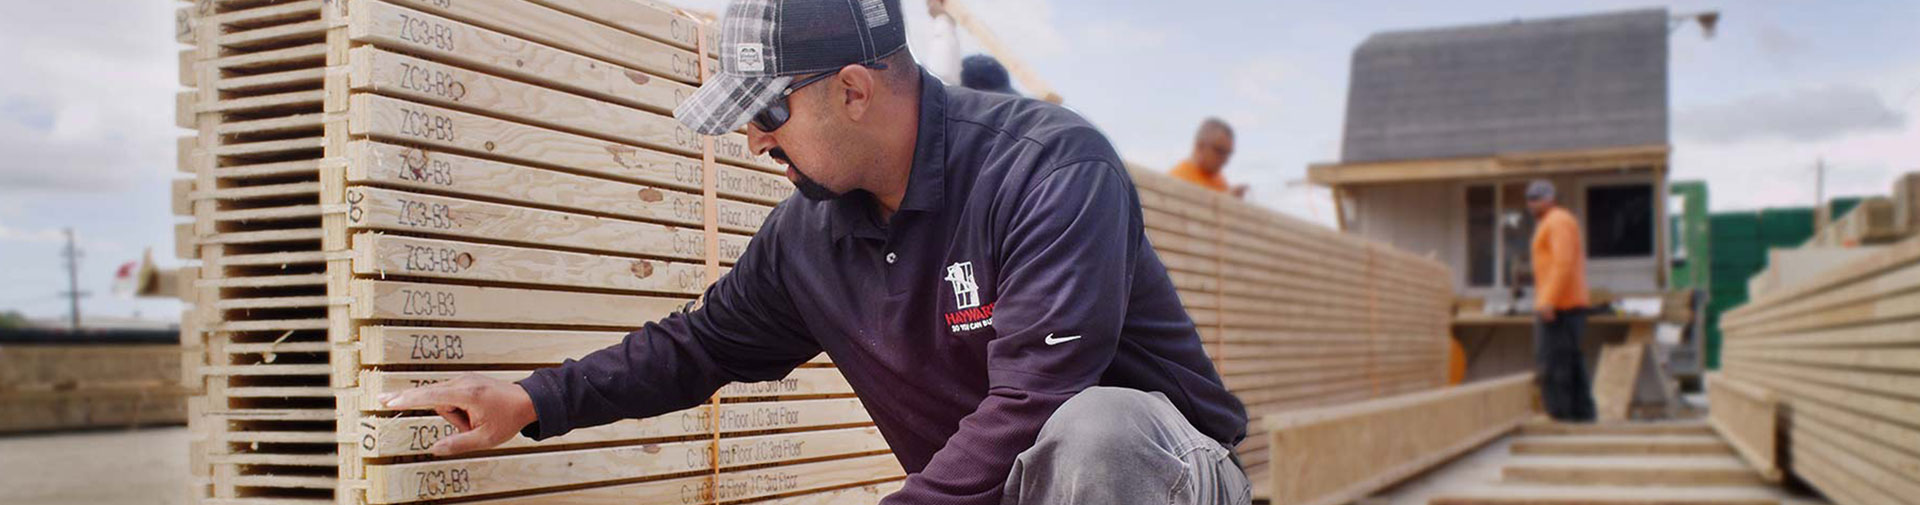 Building Materials. Lumber. Trusses.